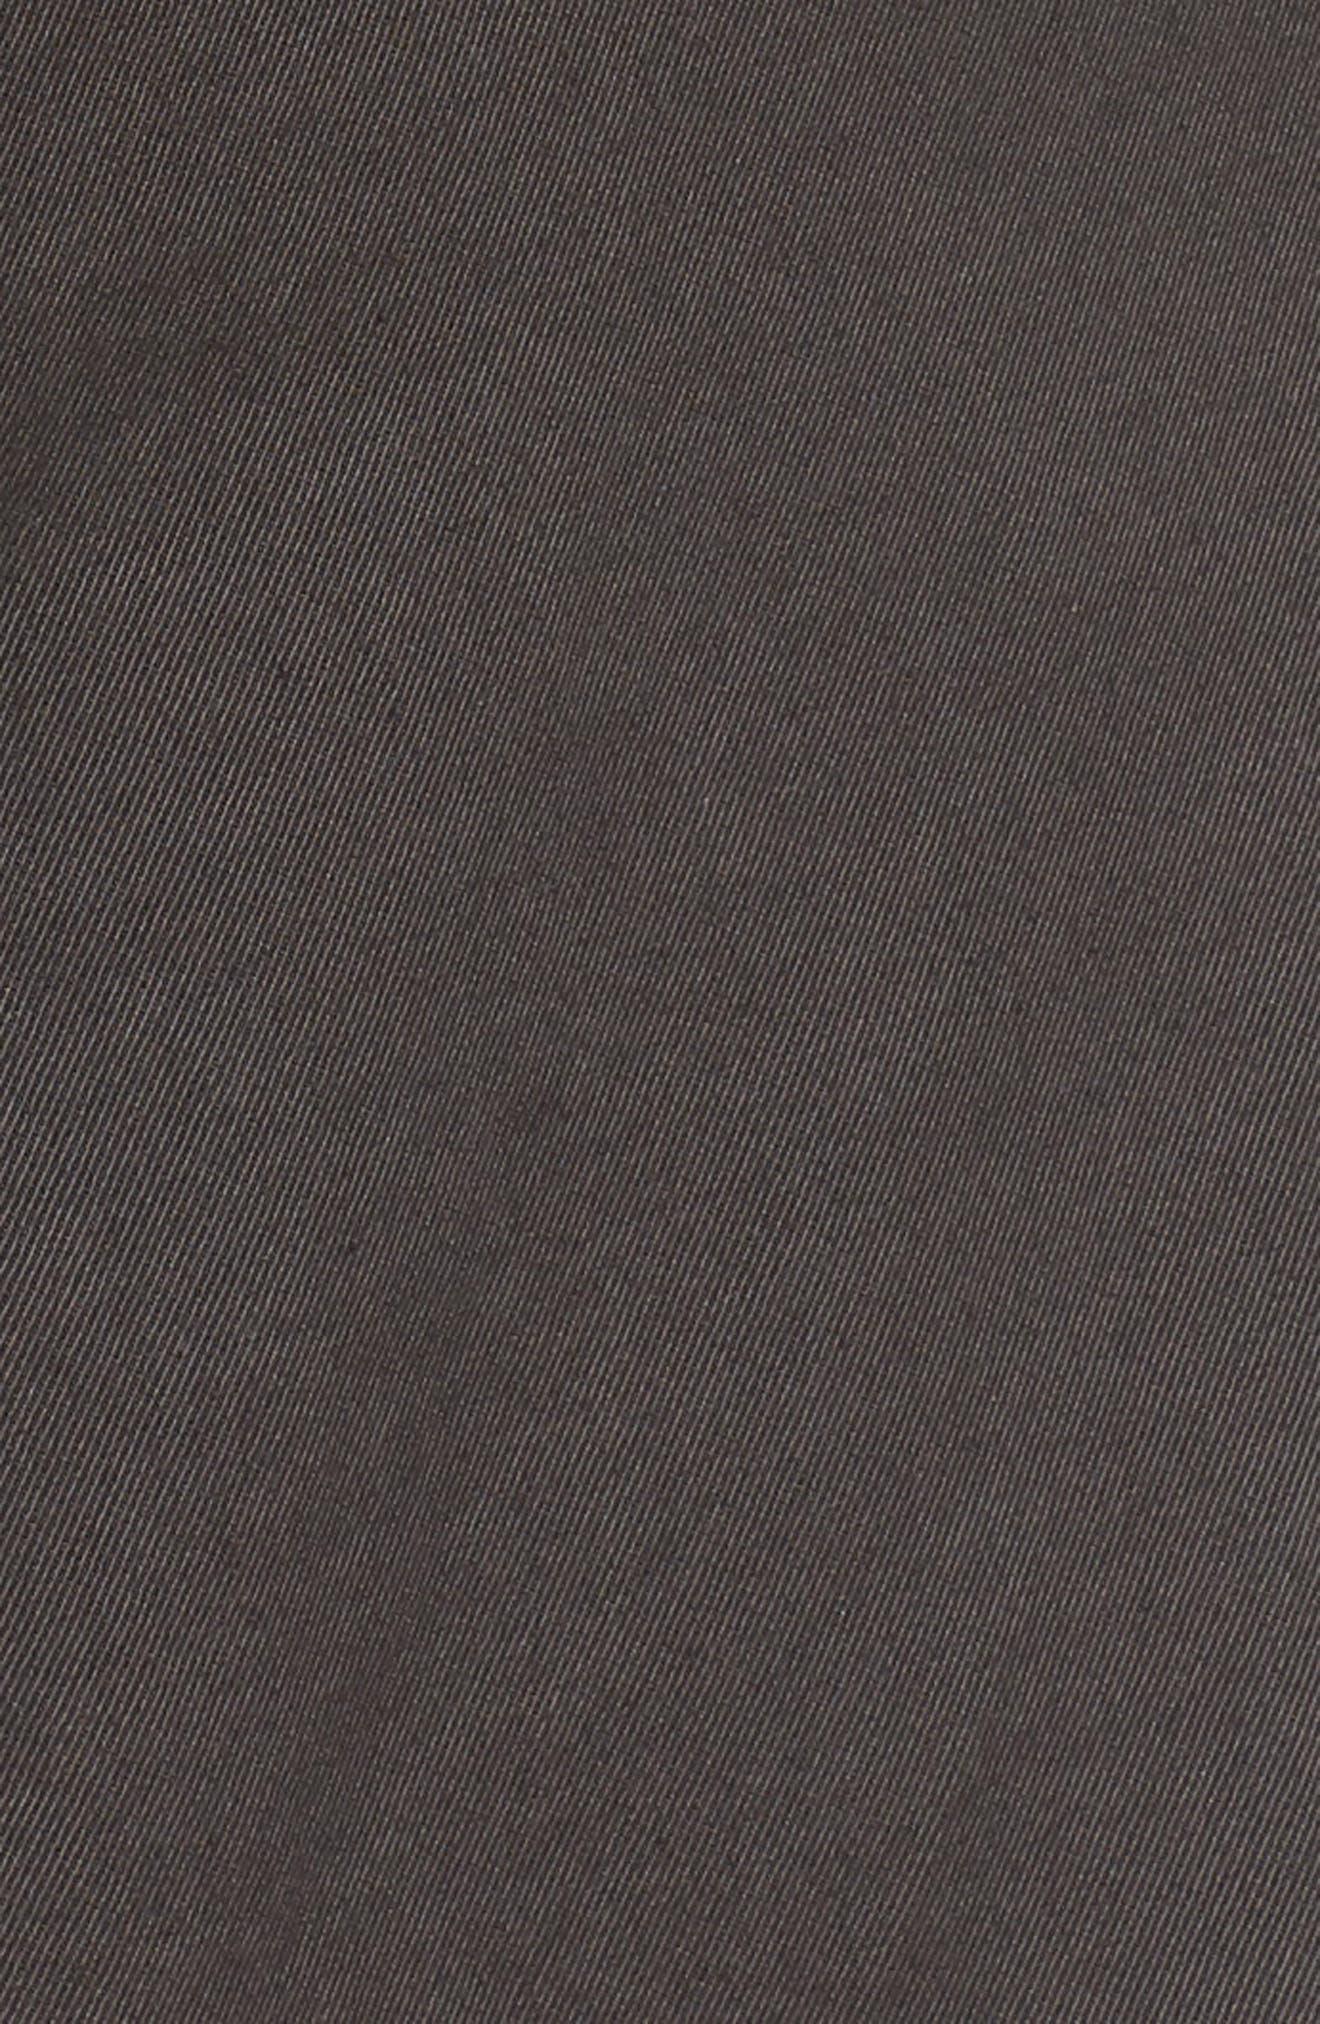 Alternate Image 5  - AG Marshall Slim Straight Leg Chino Pants